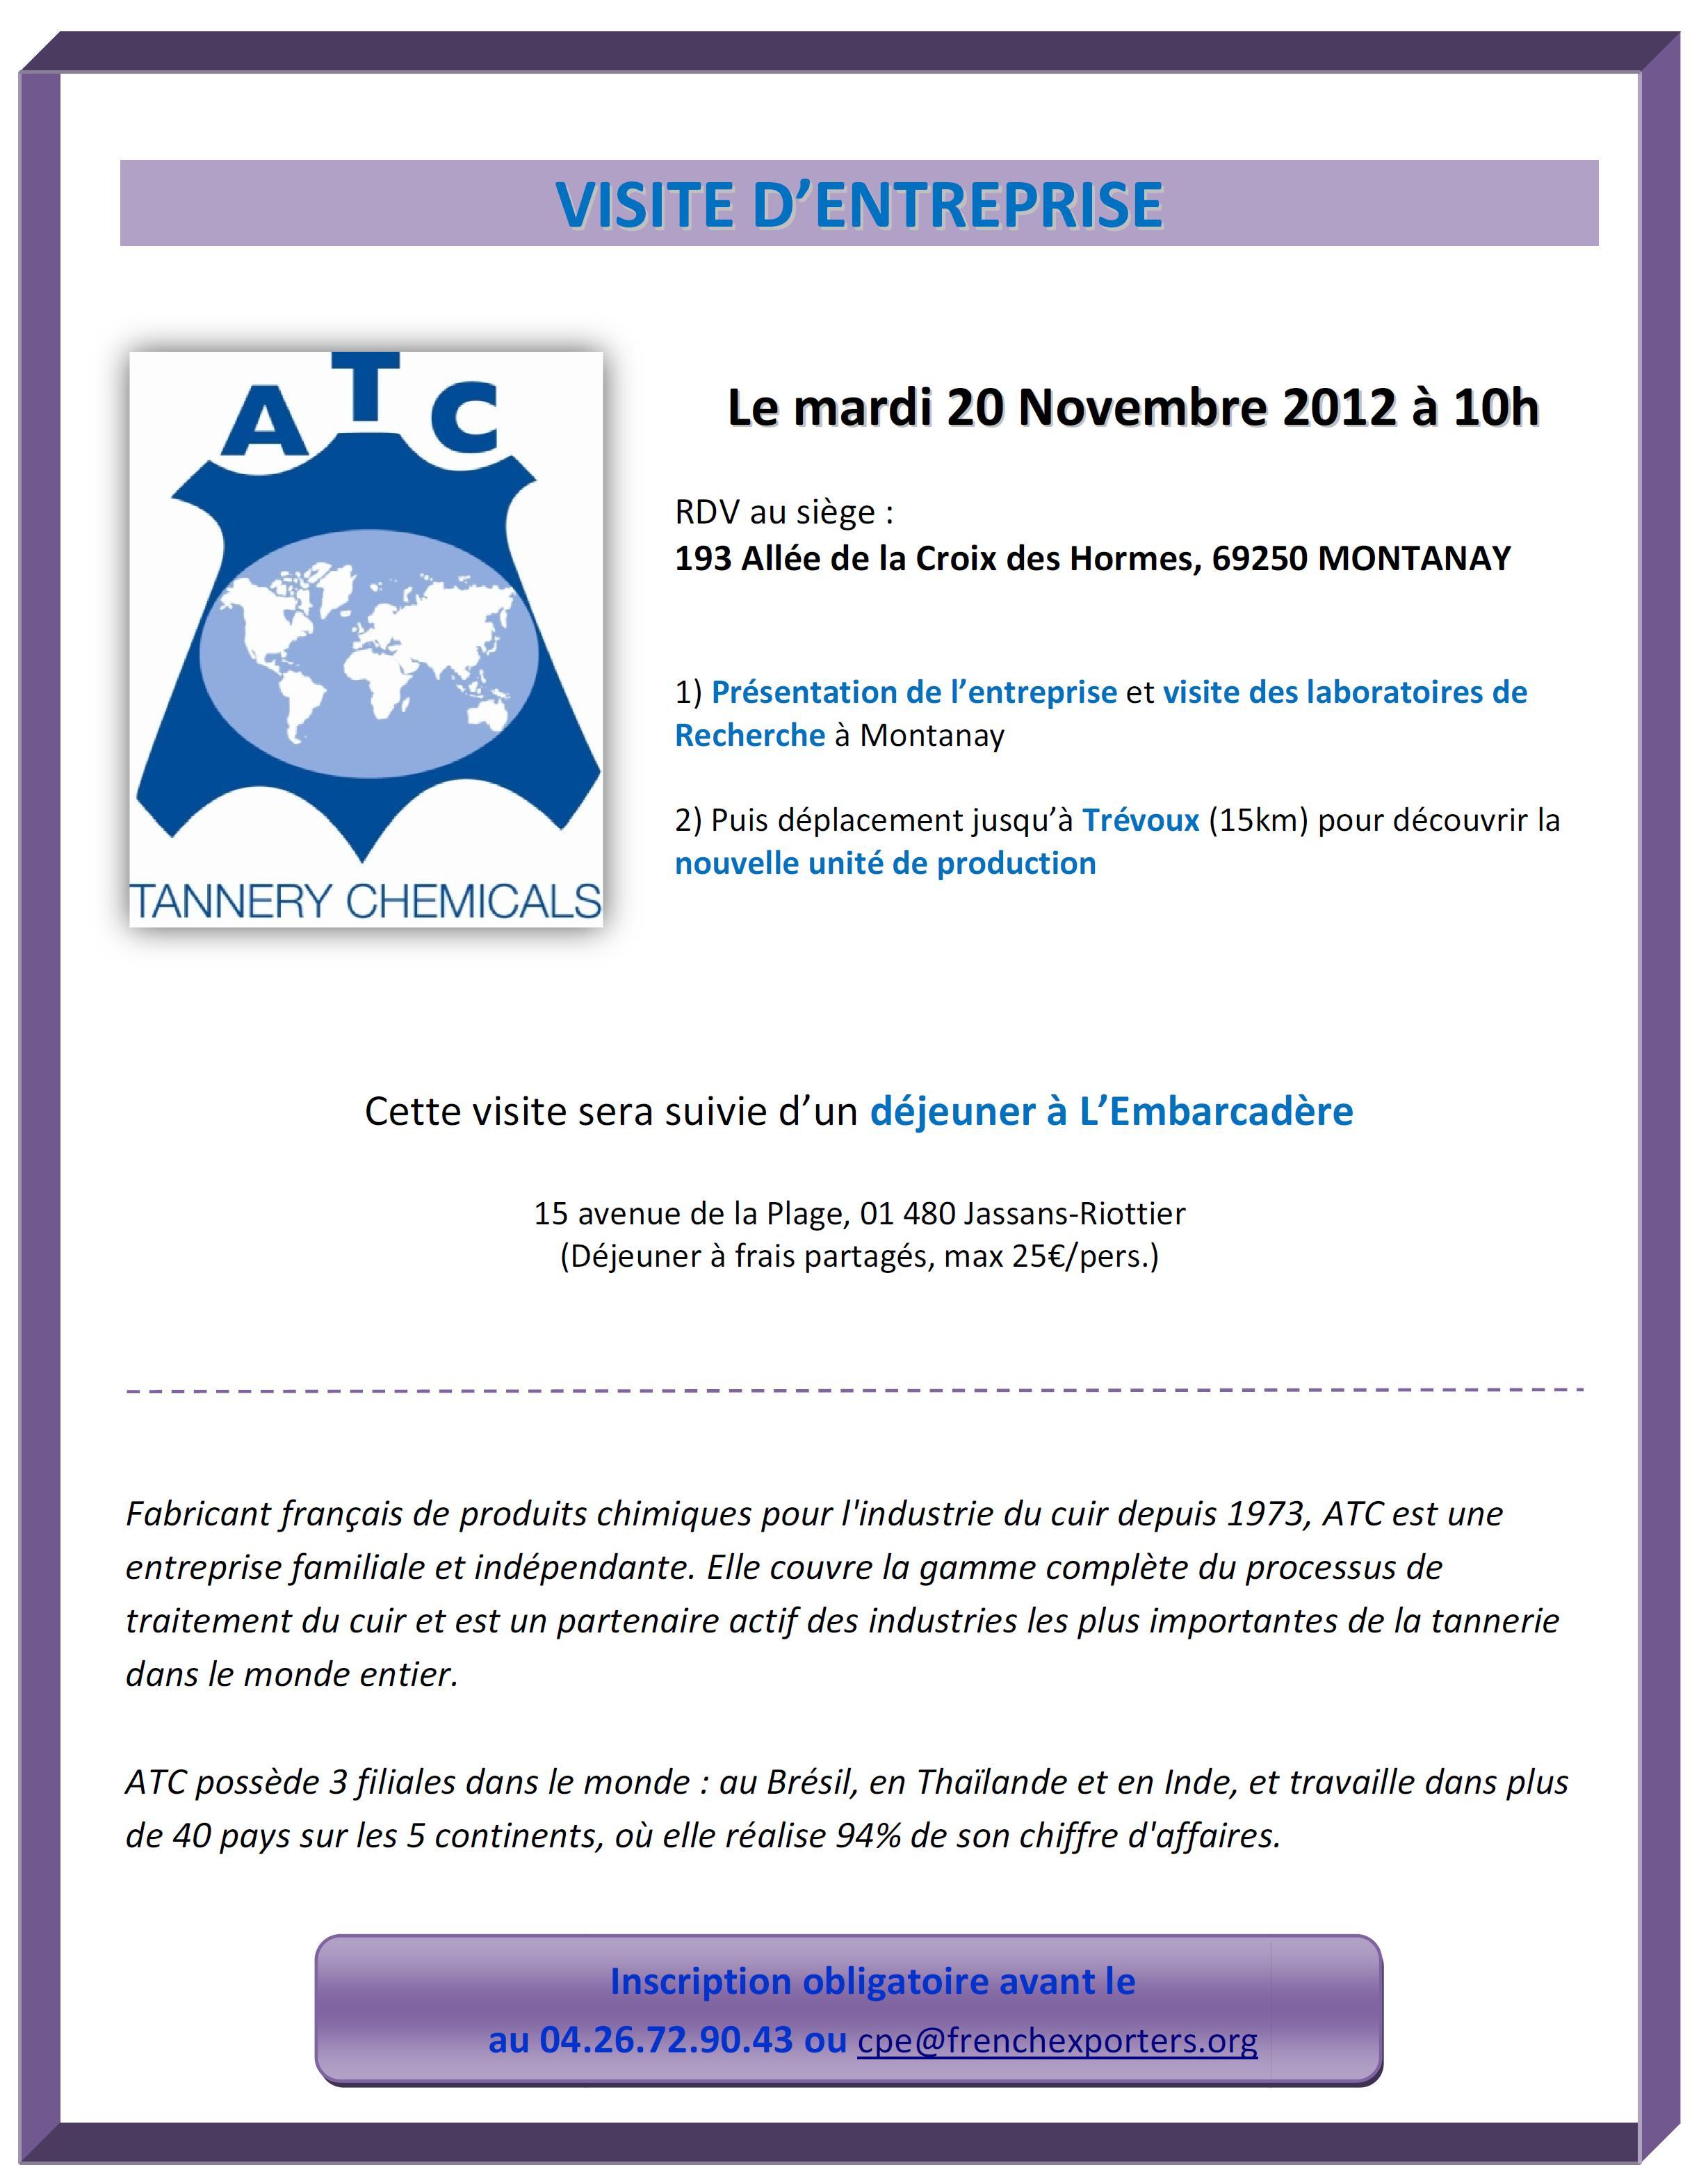 http://sd-1.archive-host.com/membres/up/74246655422882315/CPE_2012/invit_visite_ATC.JPG